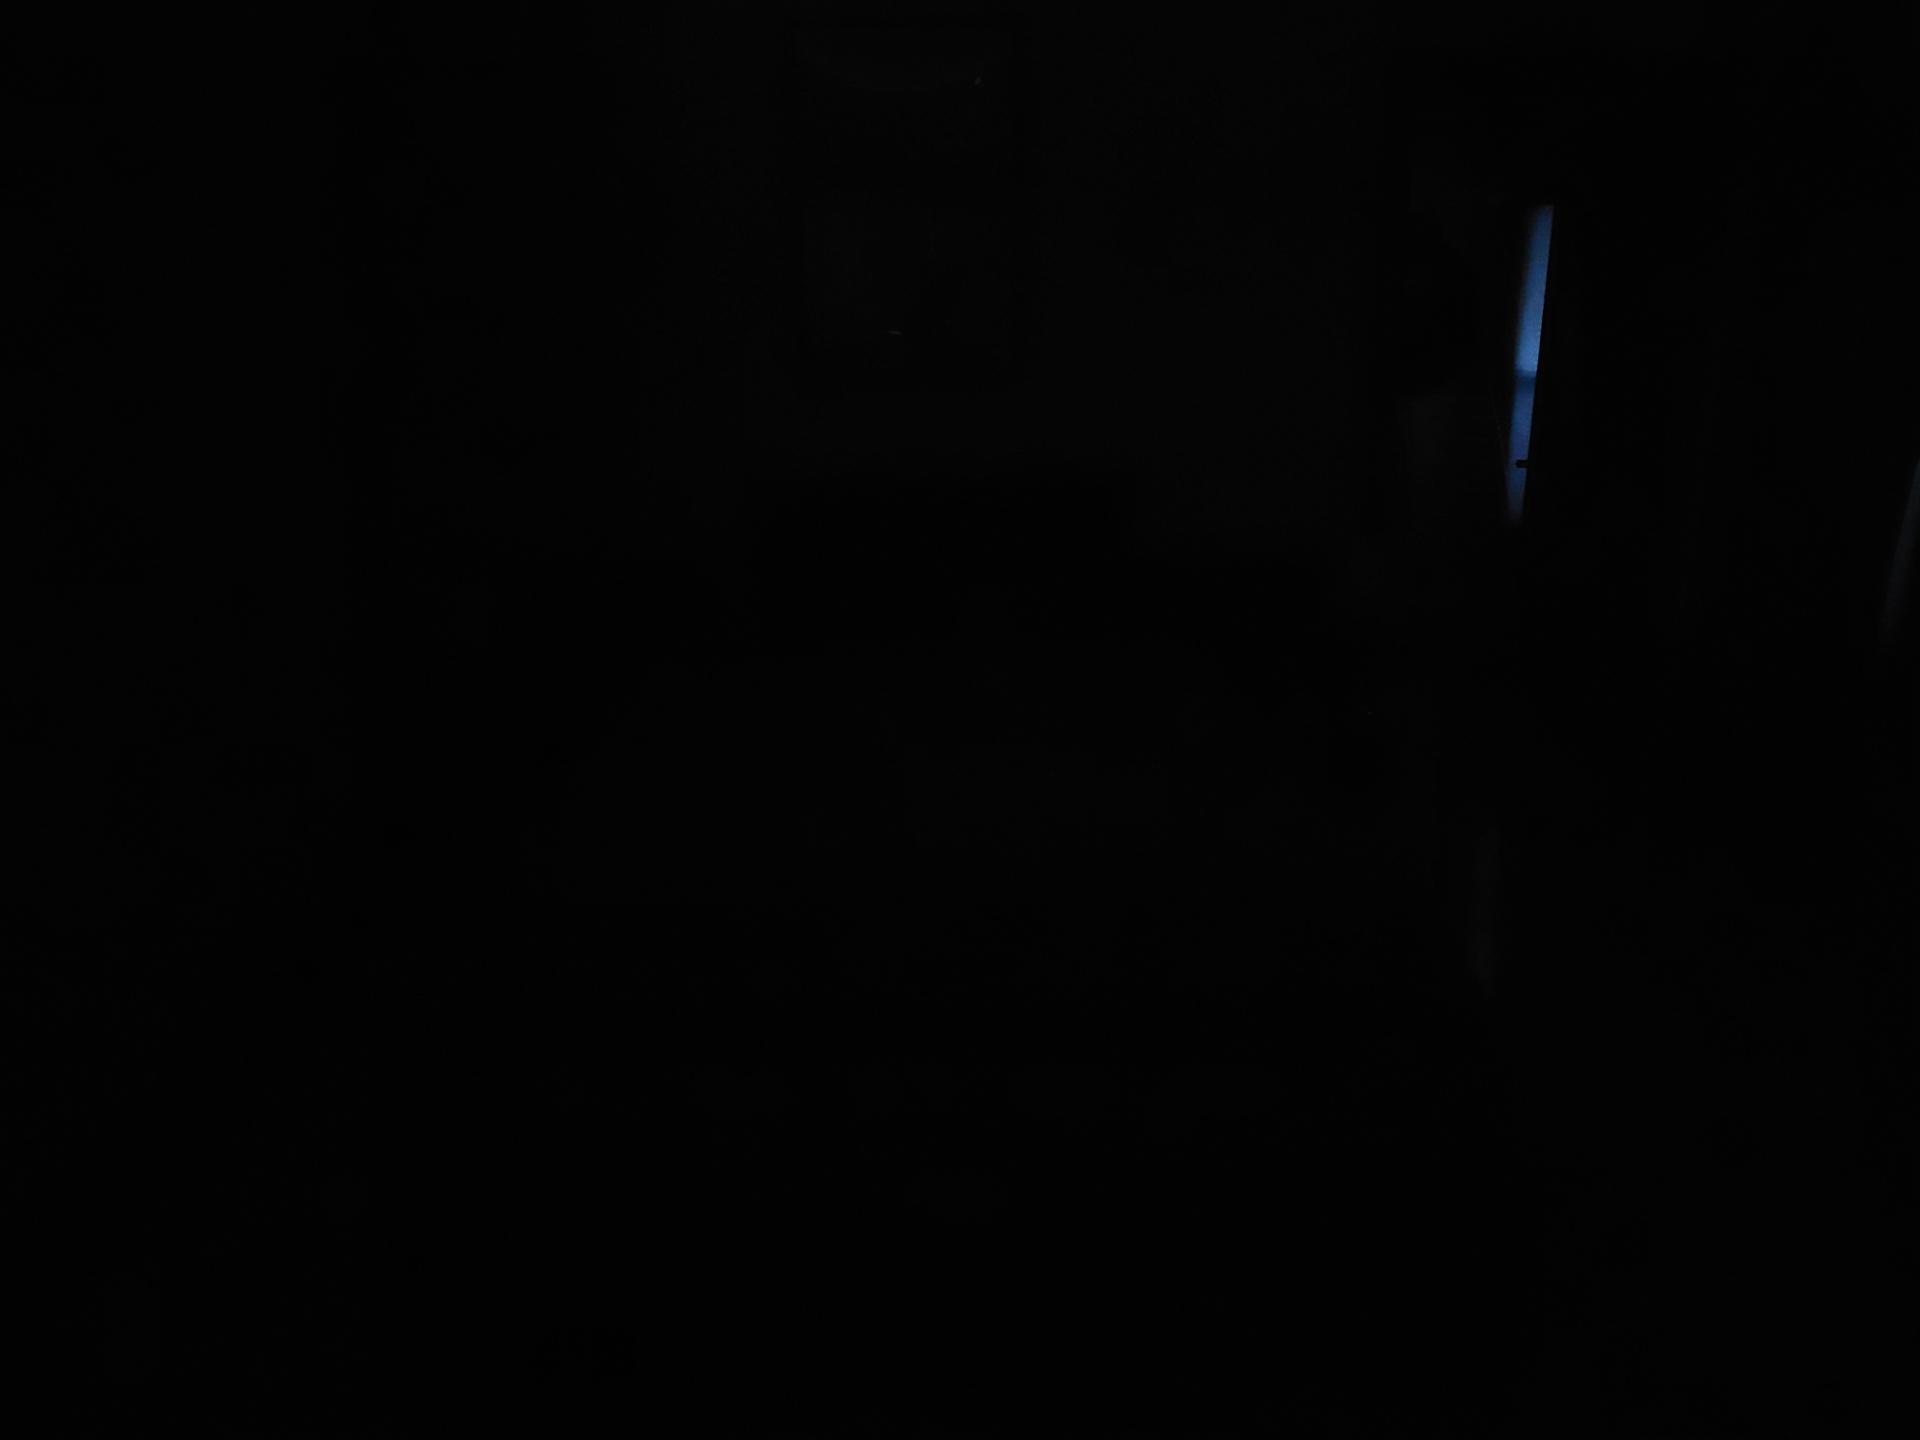 LG Wing Night View 3